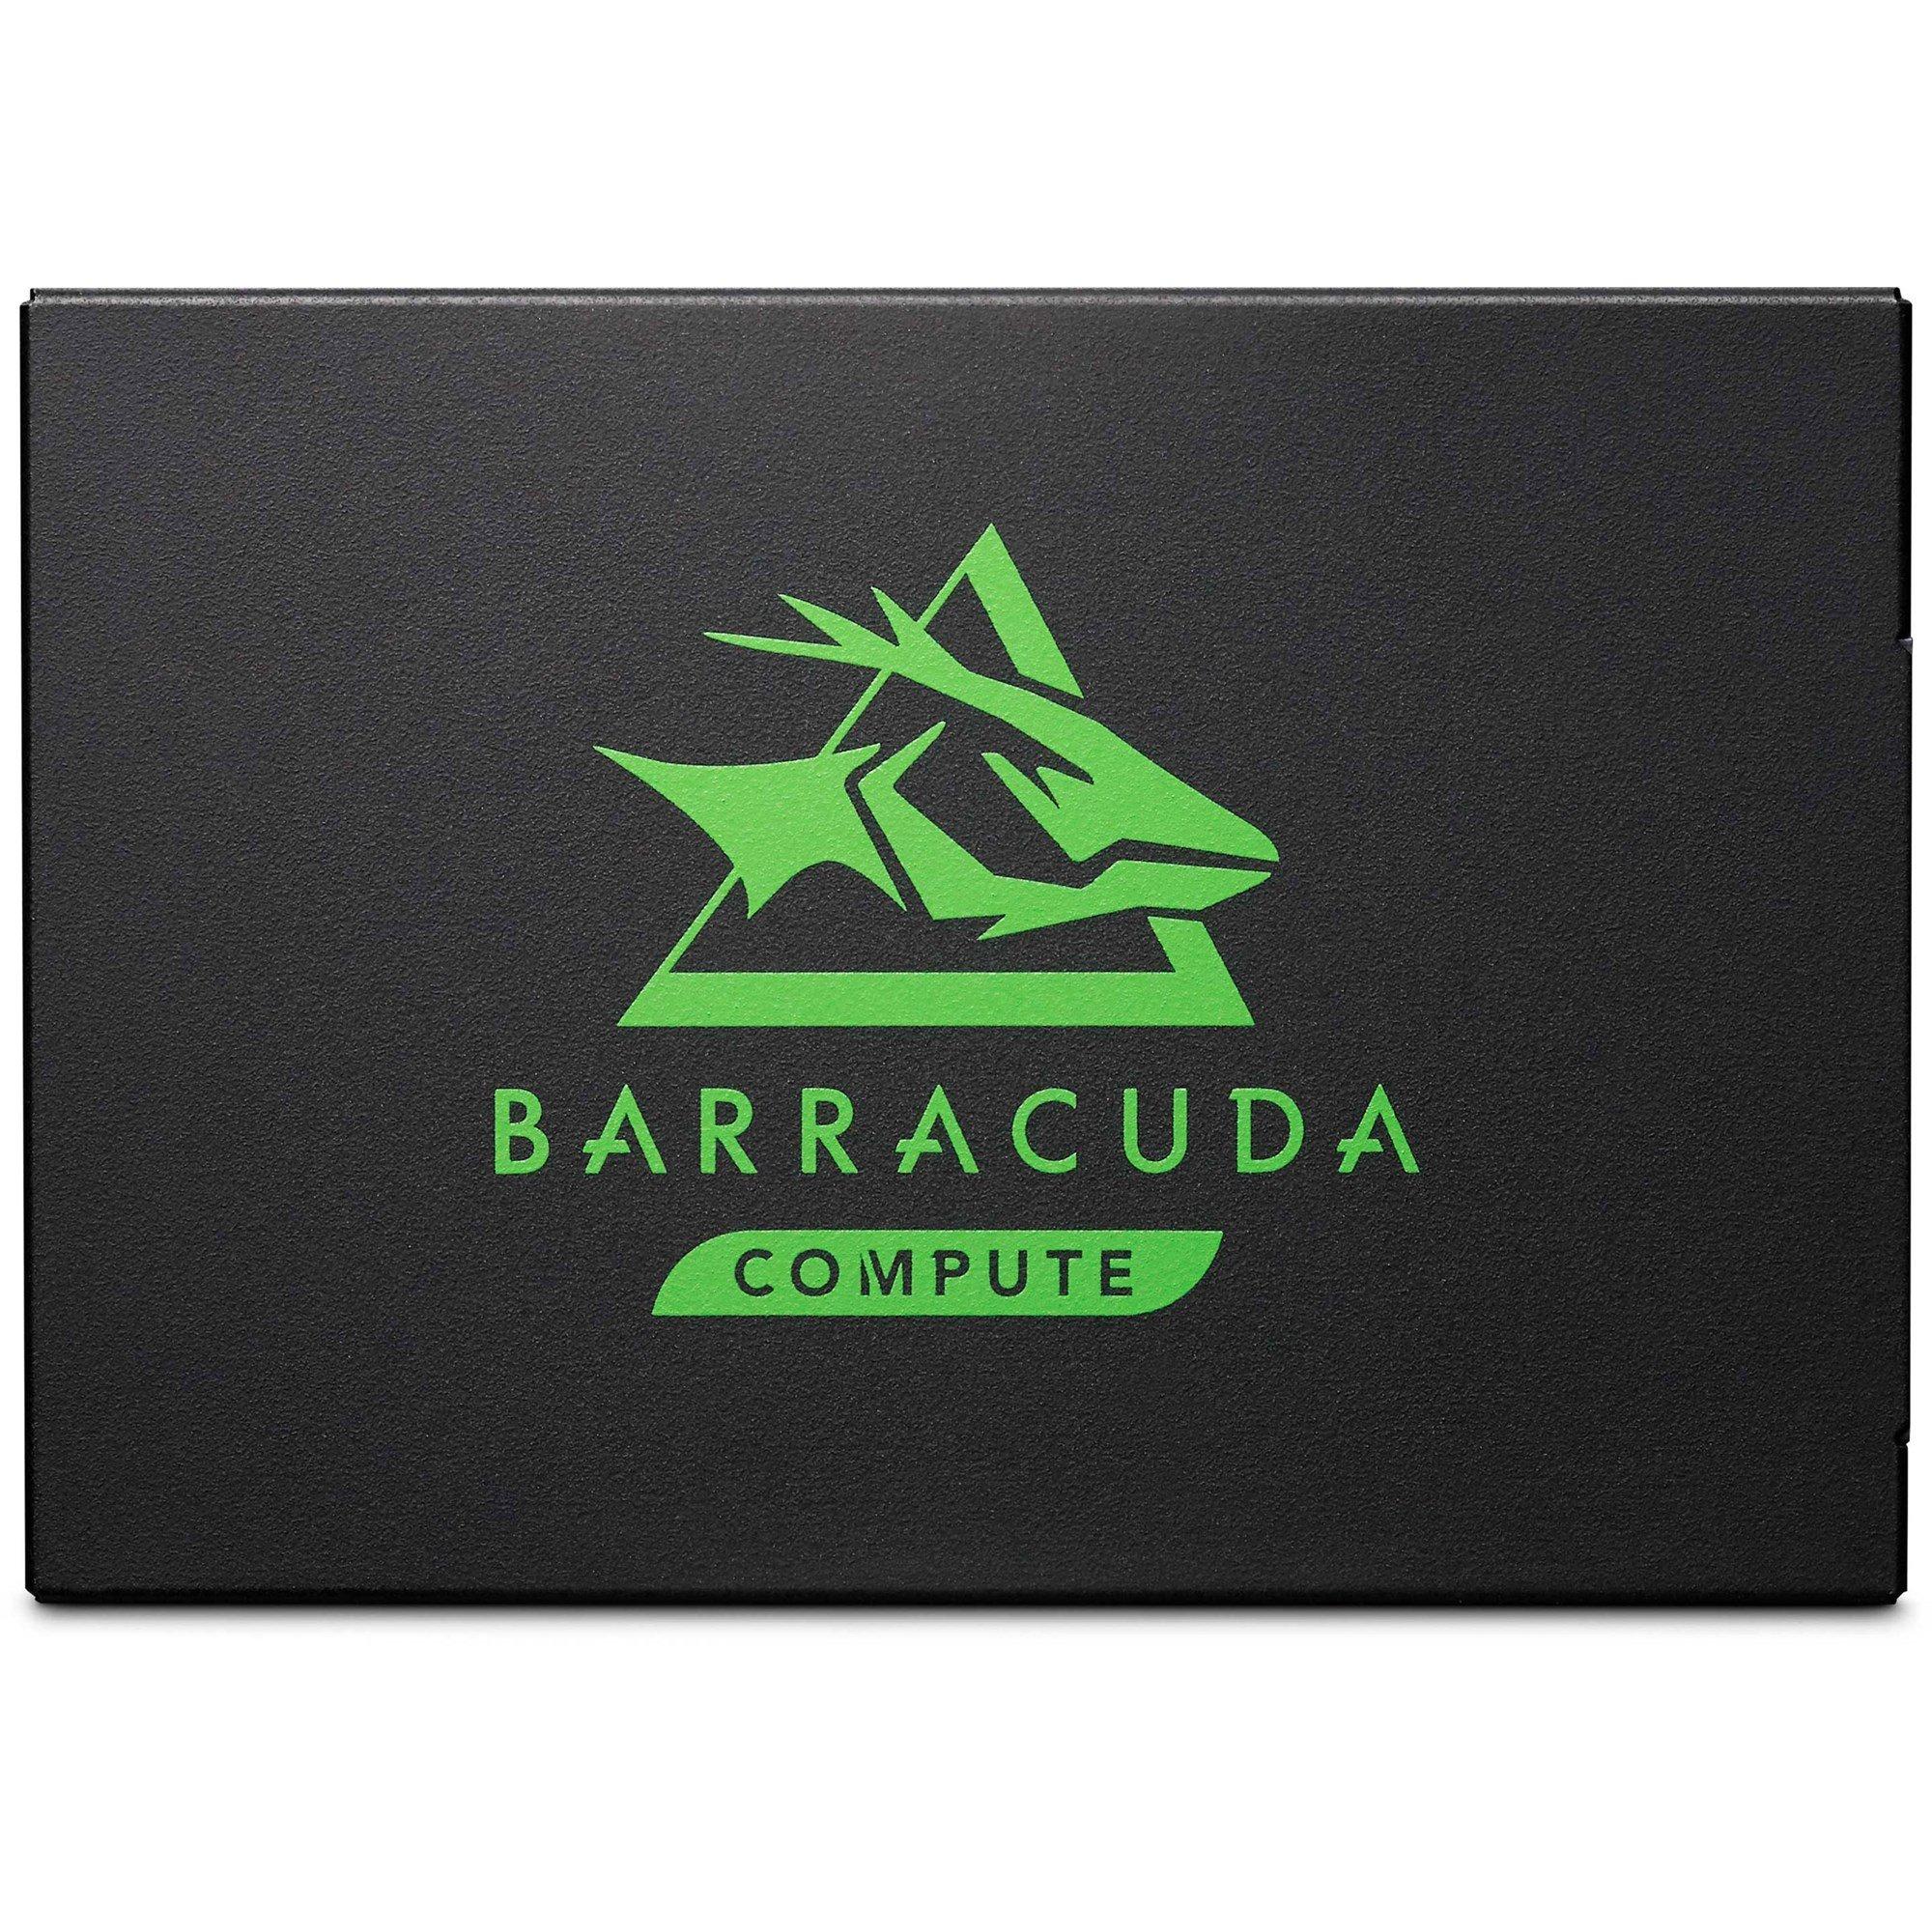 "Seagate BarraCuda 120 500GB 2.5"" SATA III SSD, 5 Year Warranty £60.06 at CCLOnline"